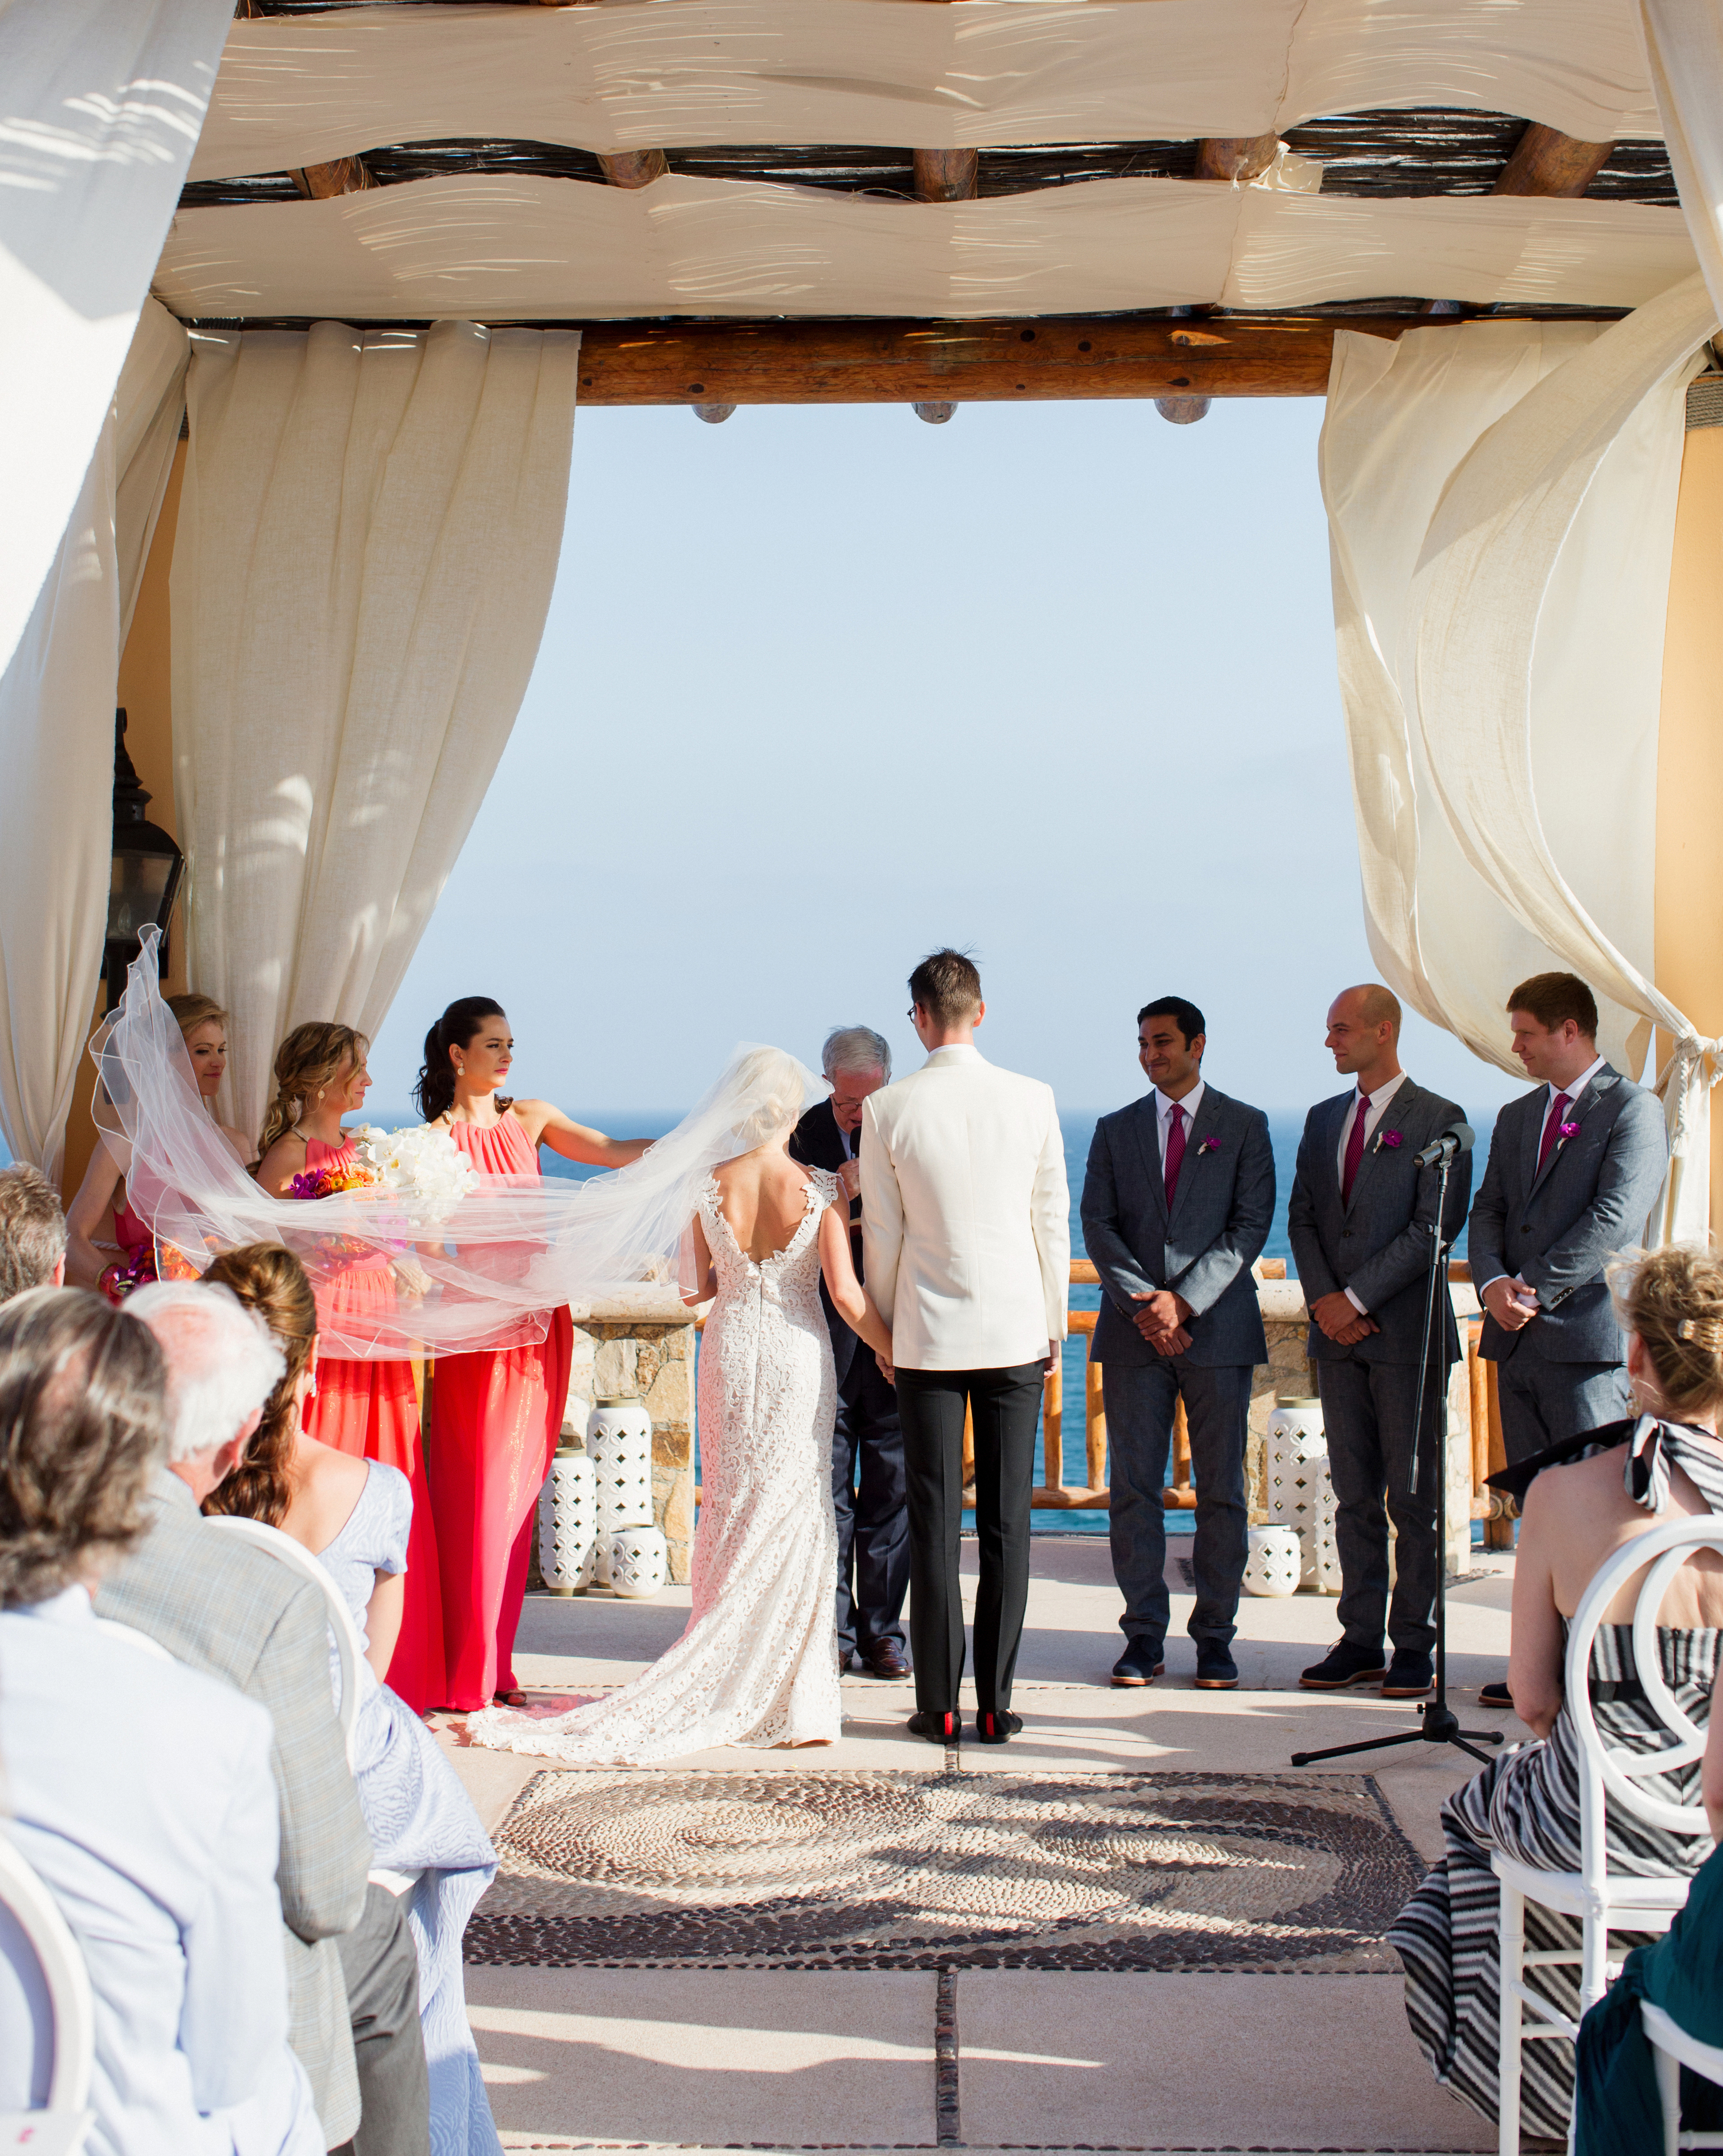 veronica-mathieu-wedding-ceremony-0861-s111501-1014.jpg